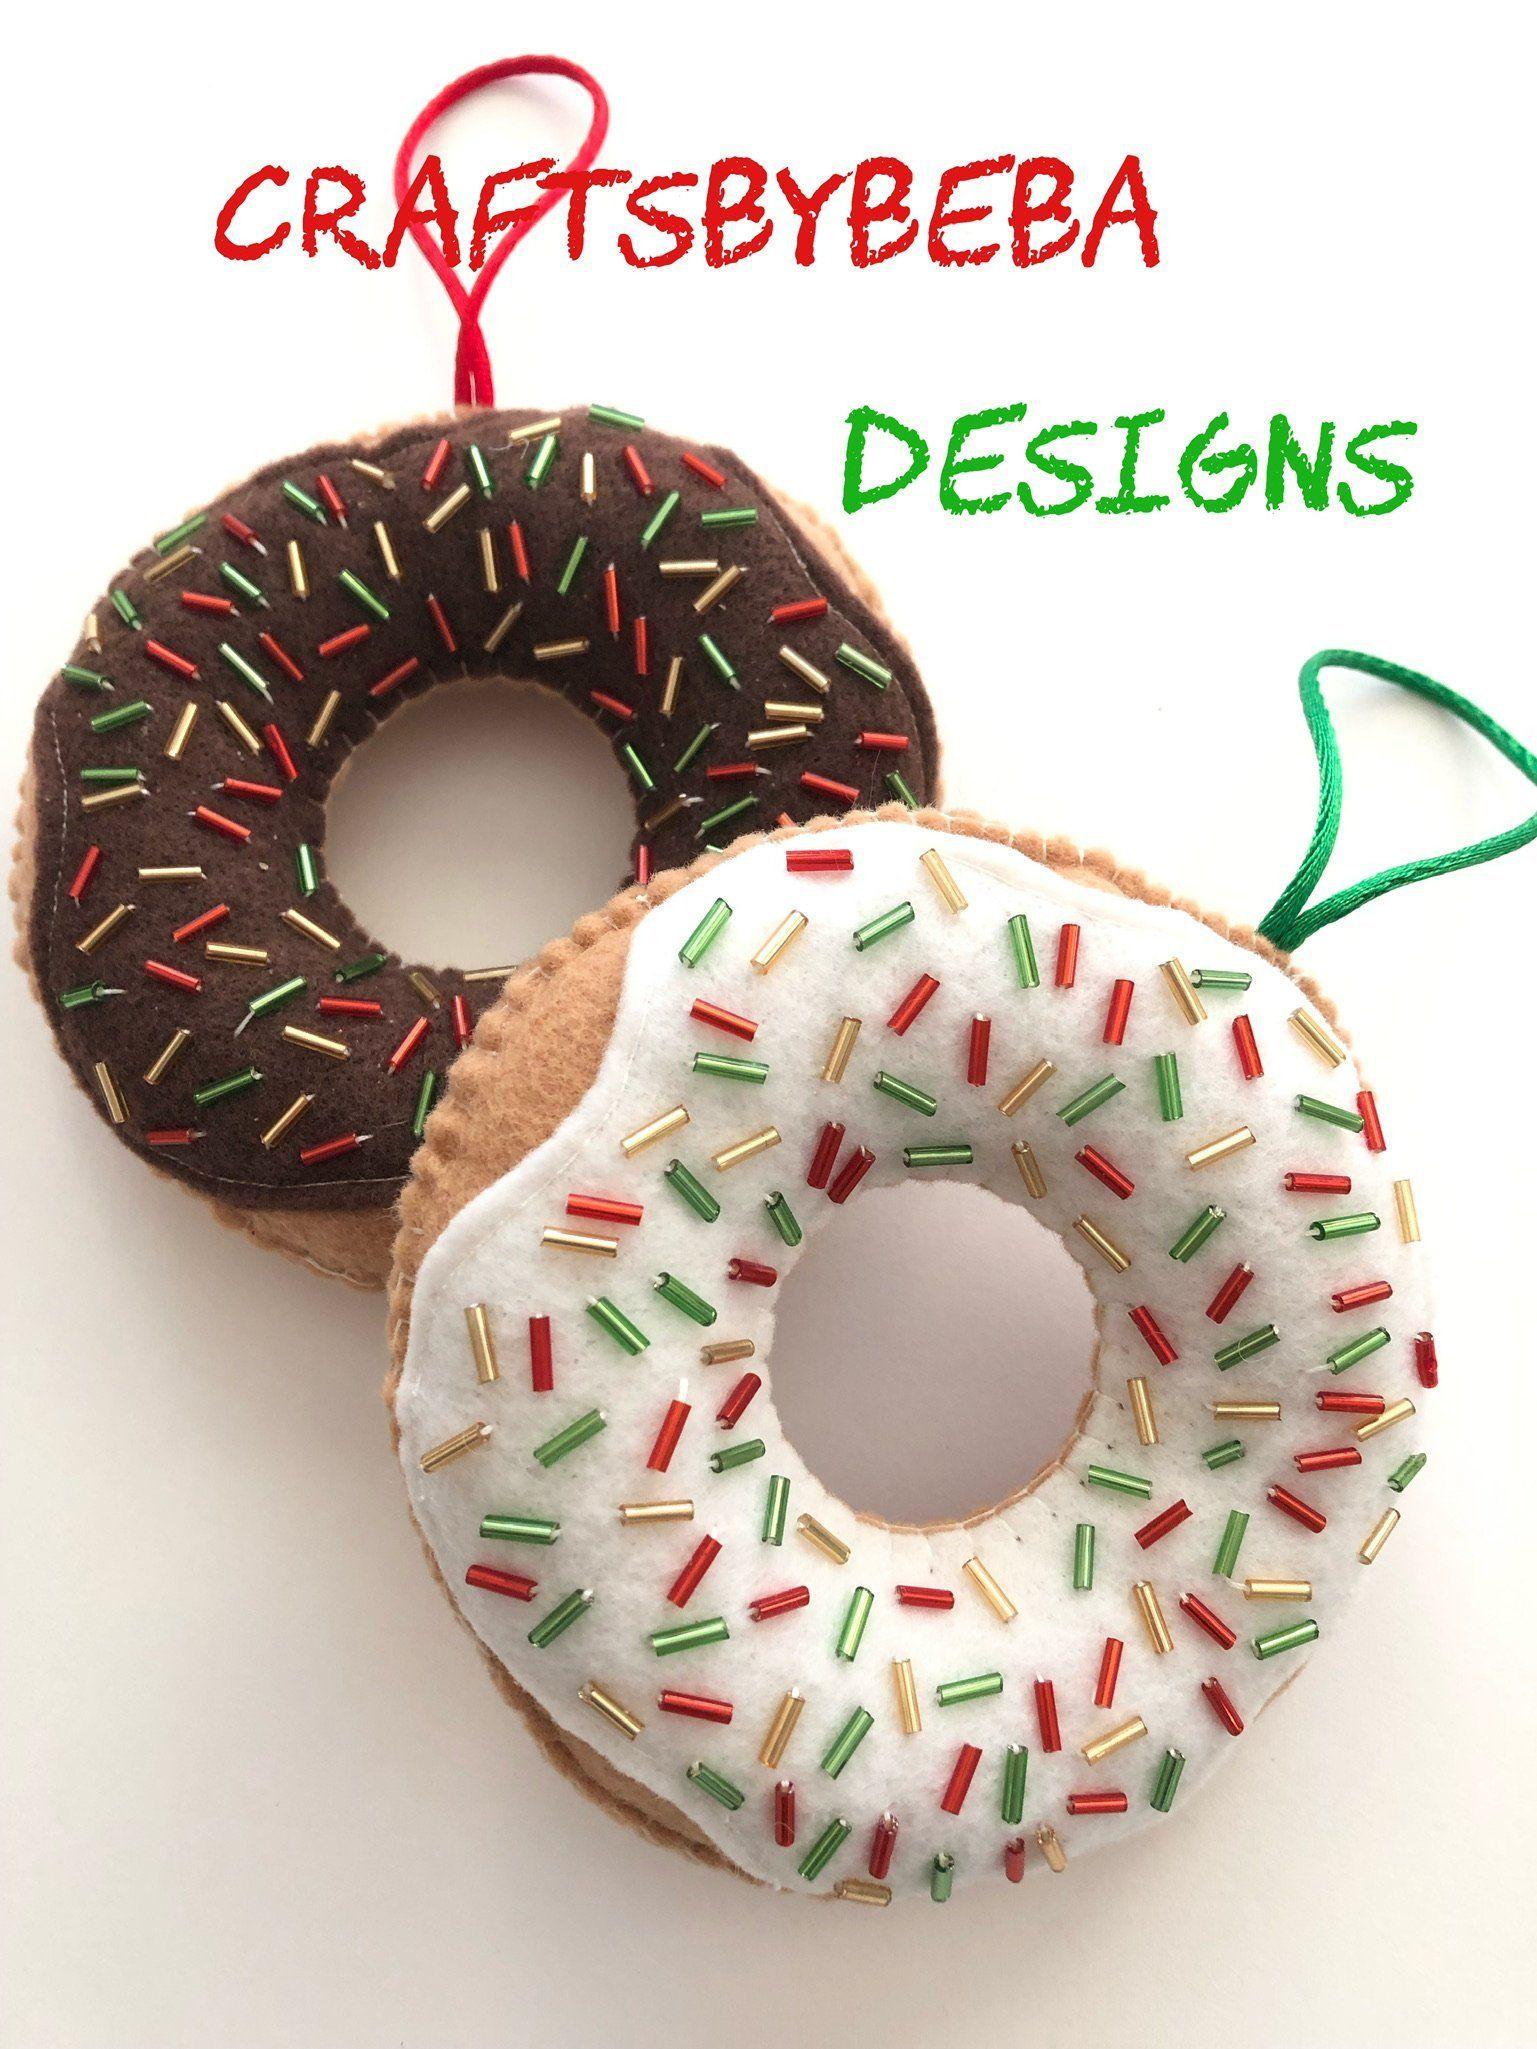 Donuts Ornaments Christmas Decor Ornaments Christmas Etsy In 2020 Christmas Ornaments Ornament Decor Christmas Donuts